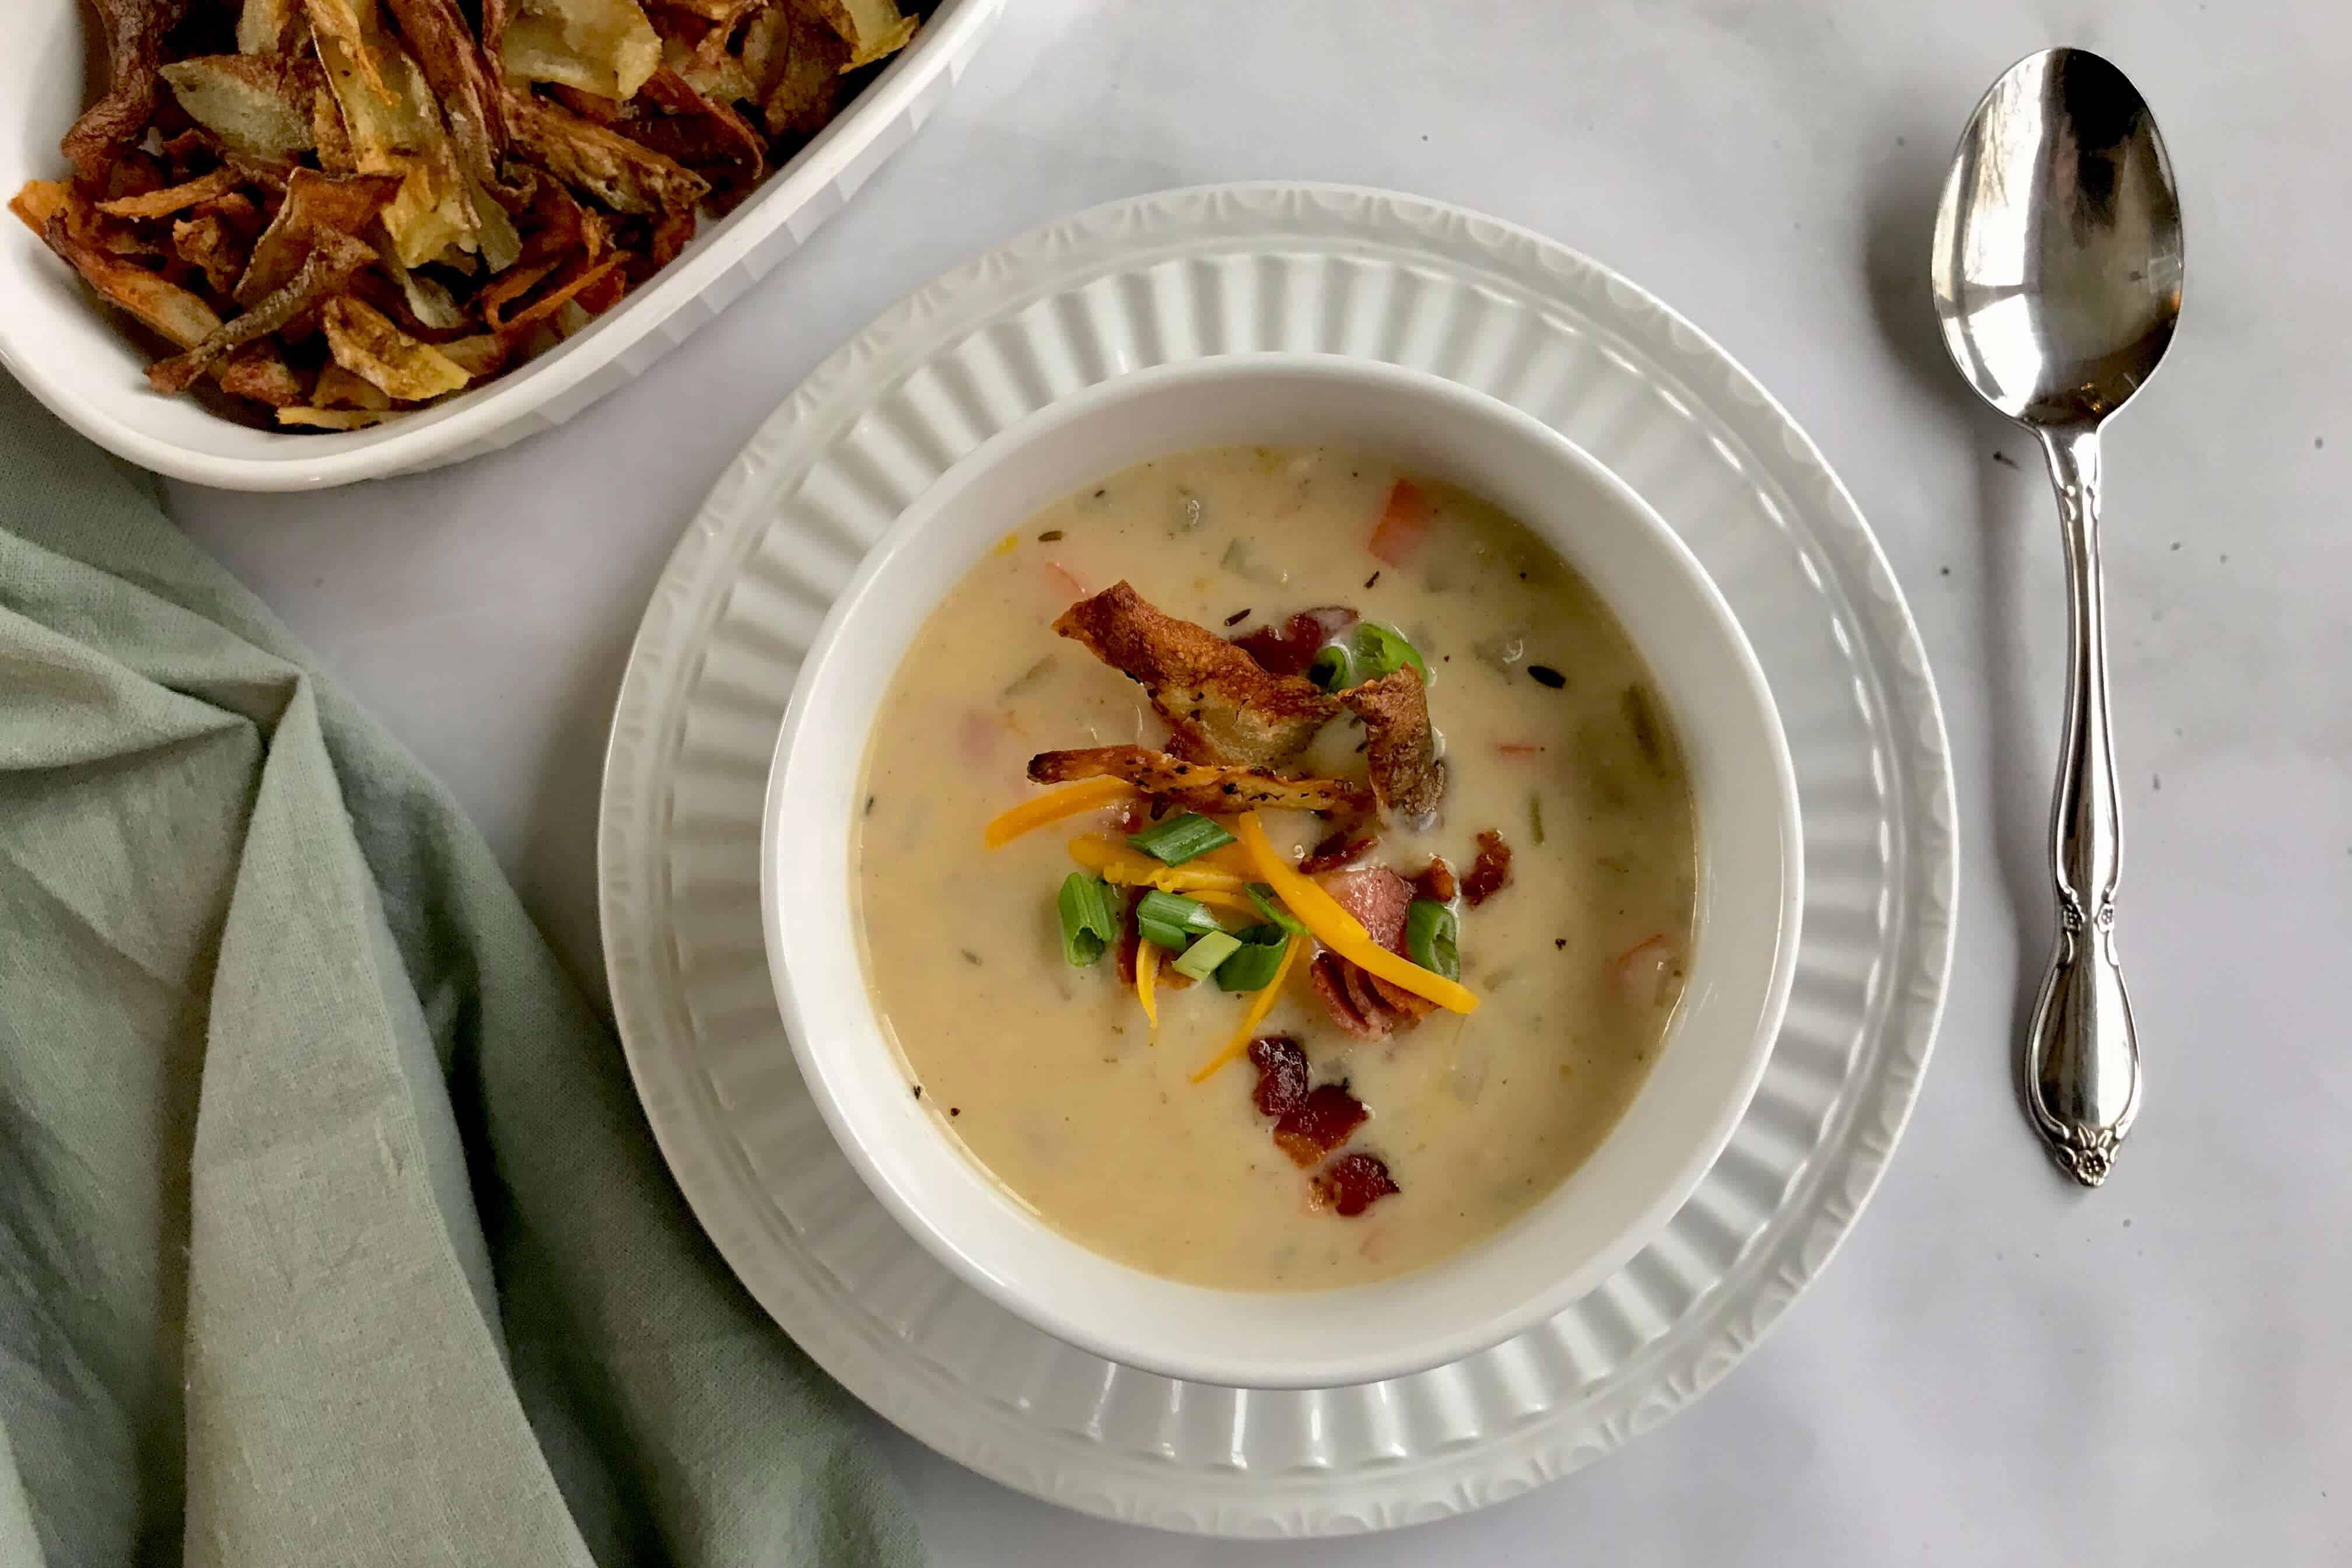 Pigskin Soup